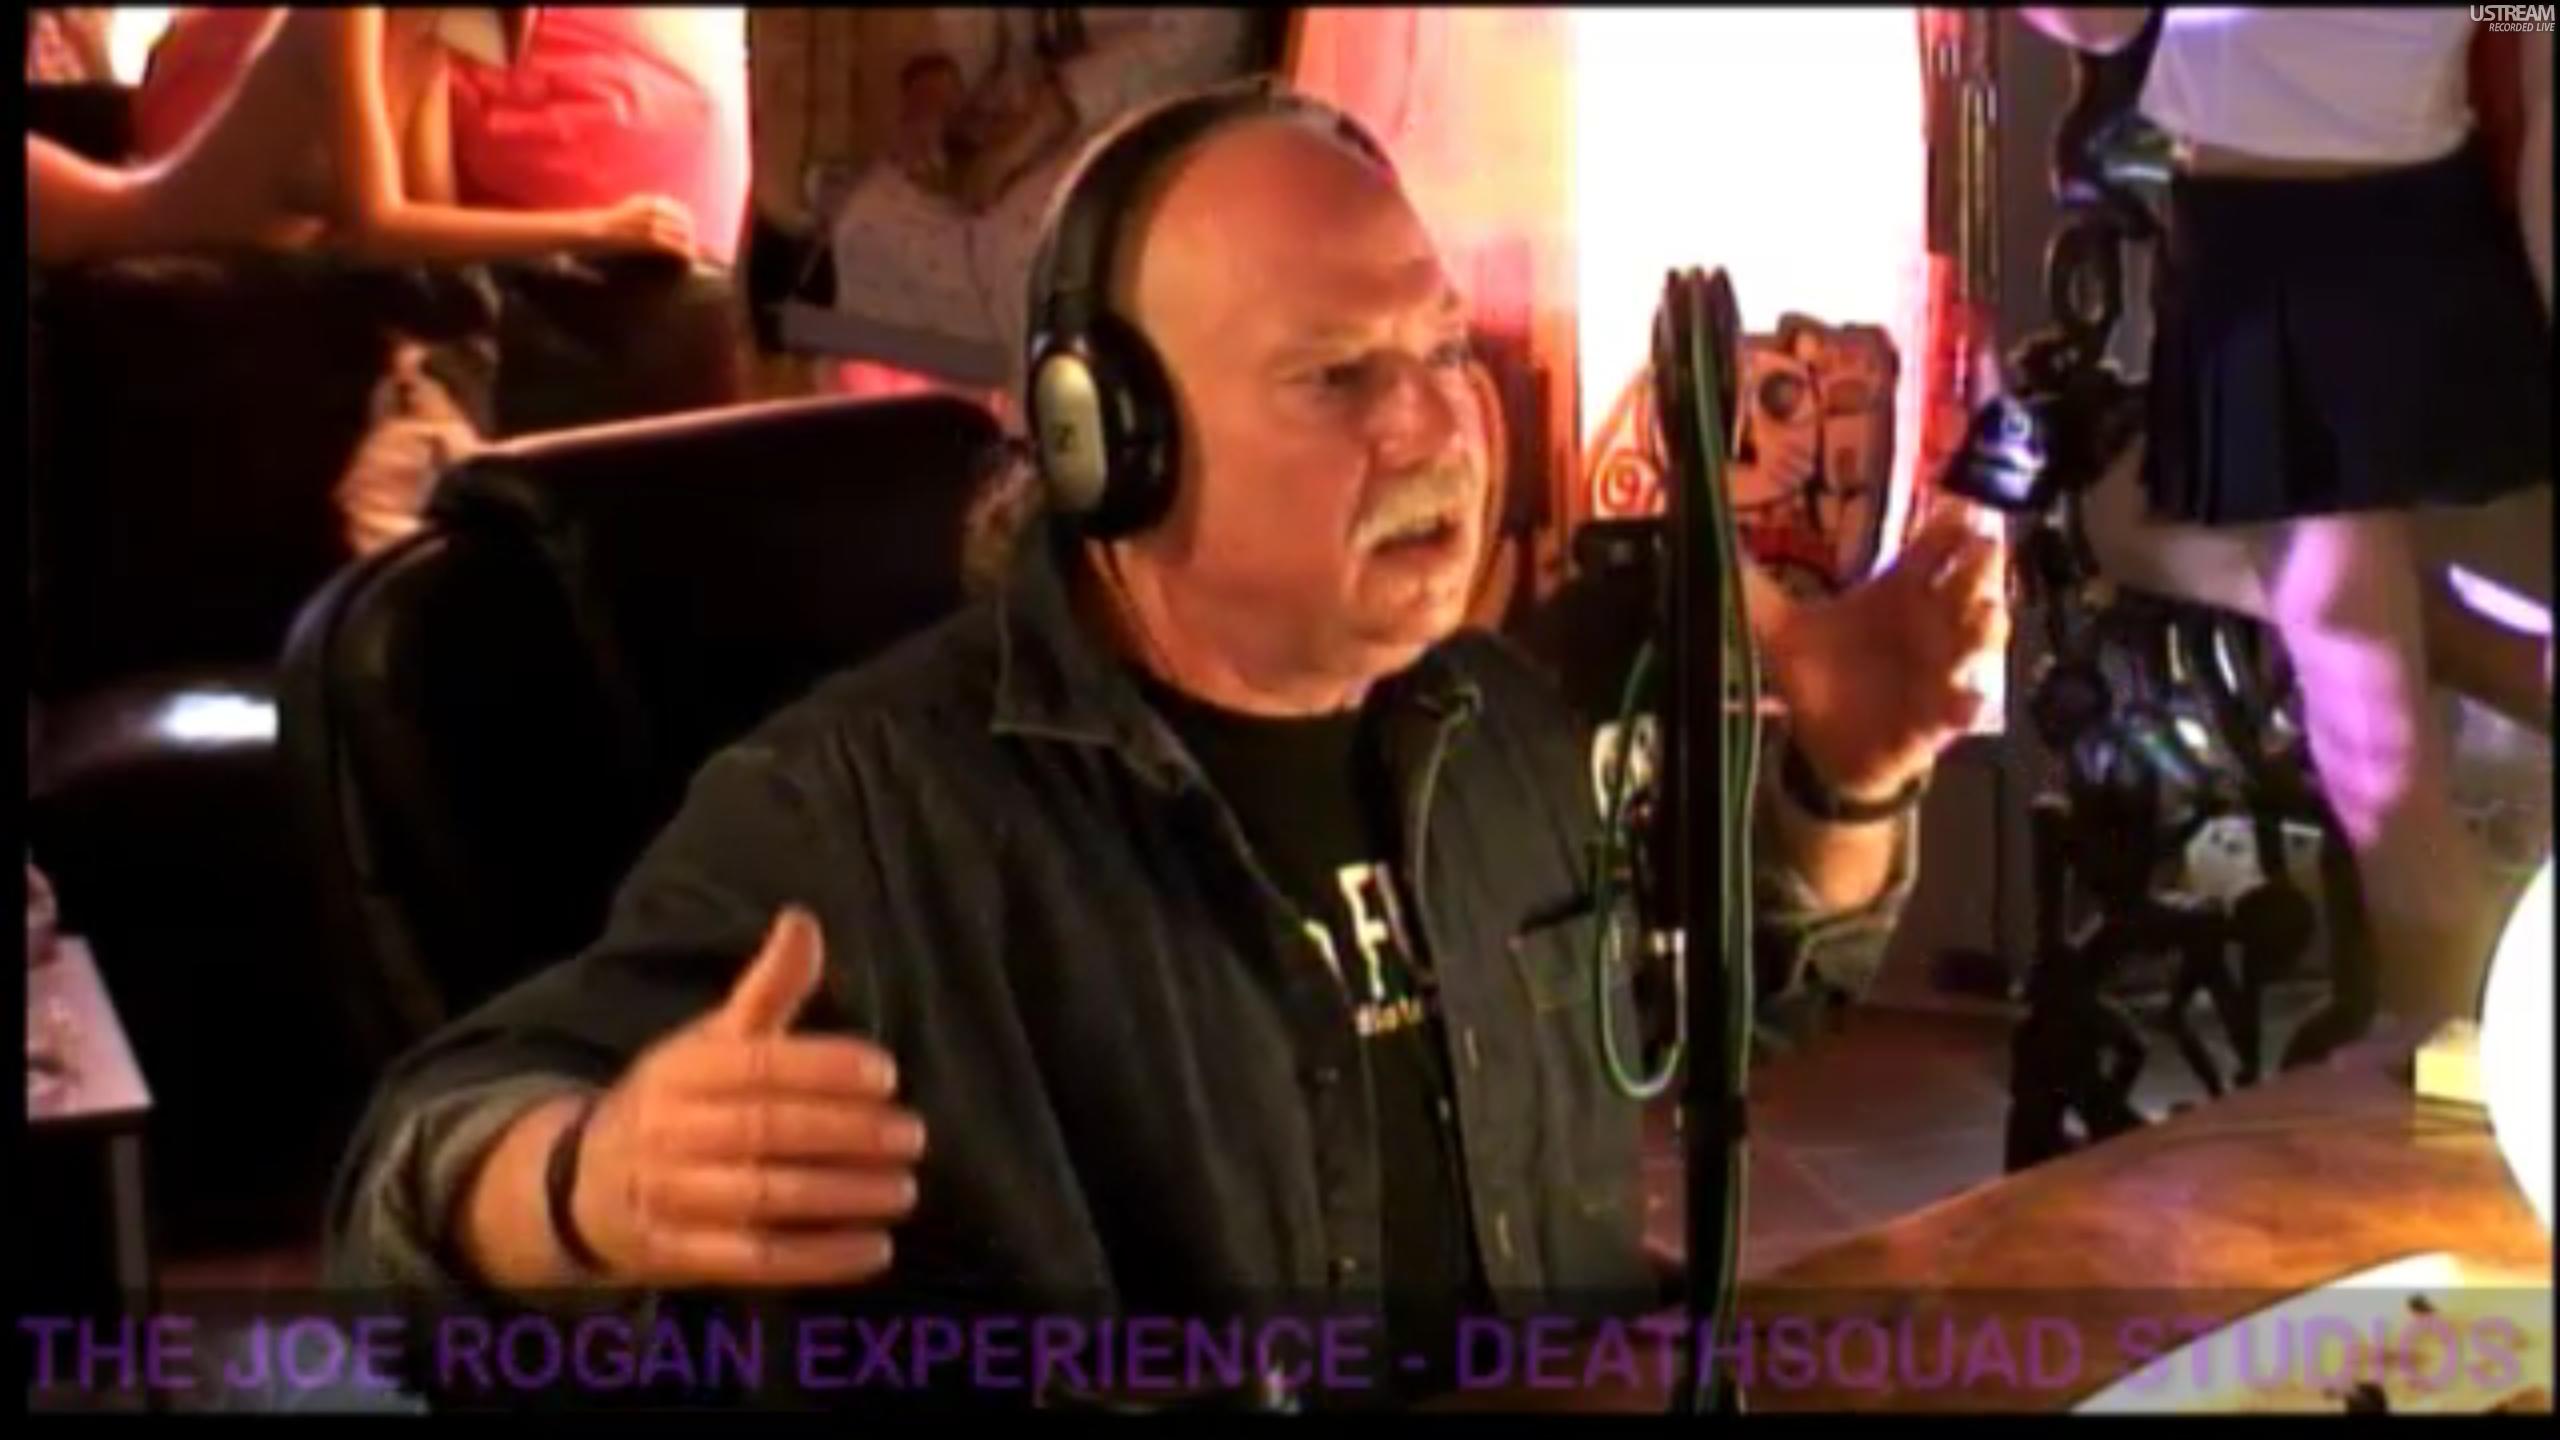 The Joe Rogan Experience #217 - Michael Ruppert, Brian Redban